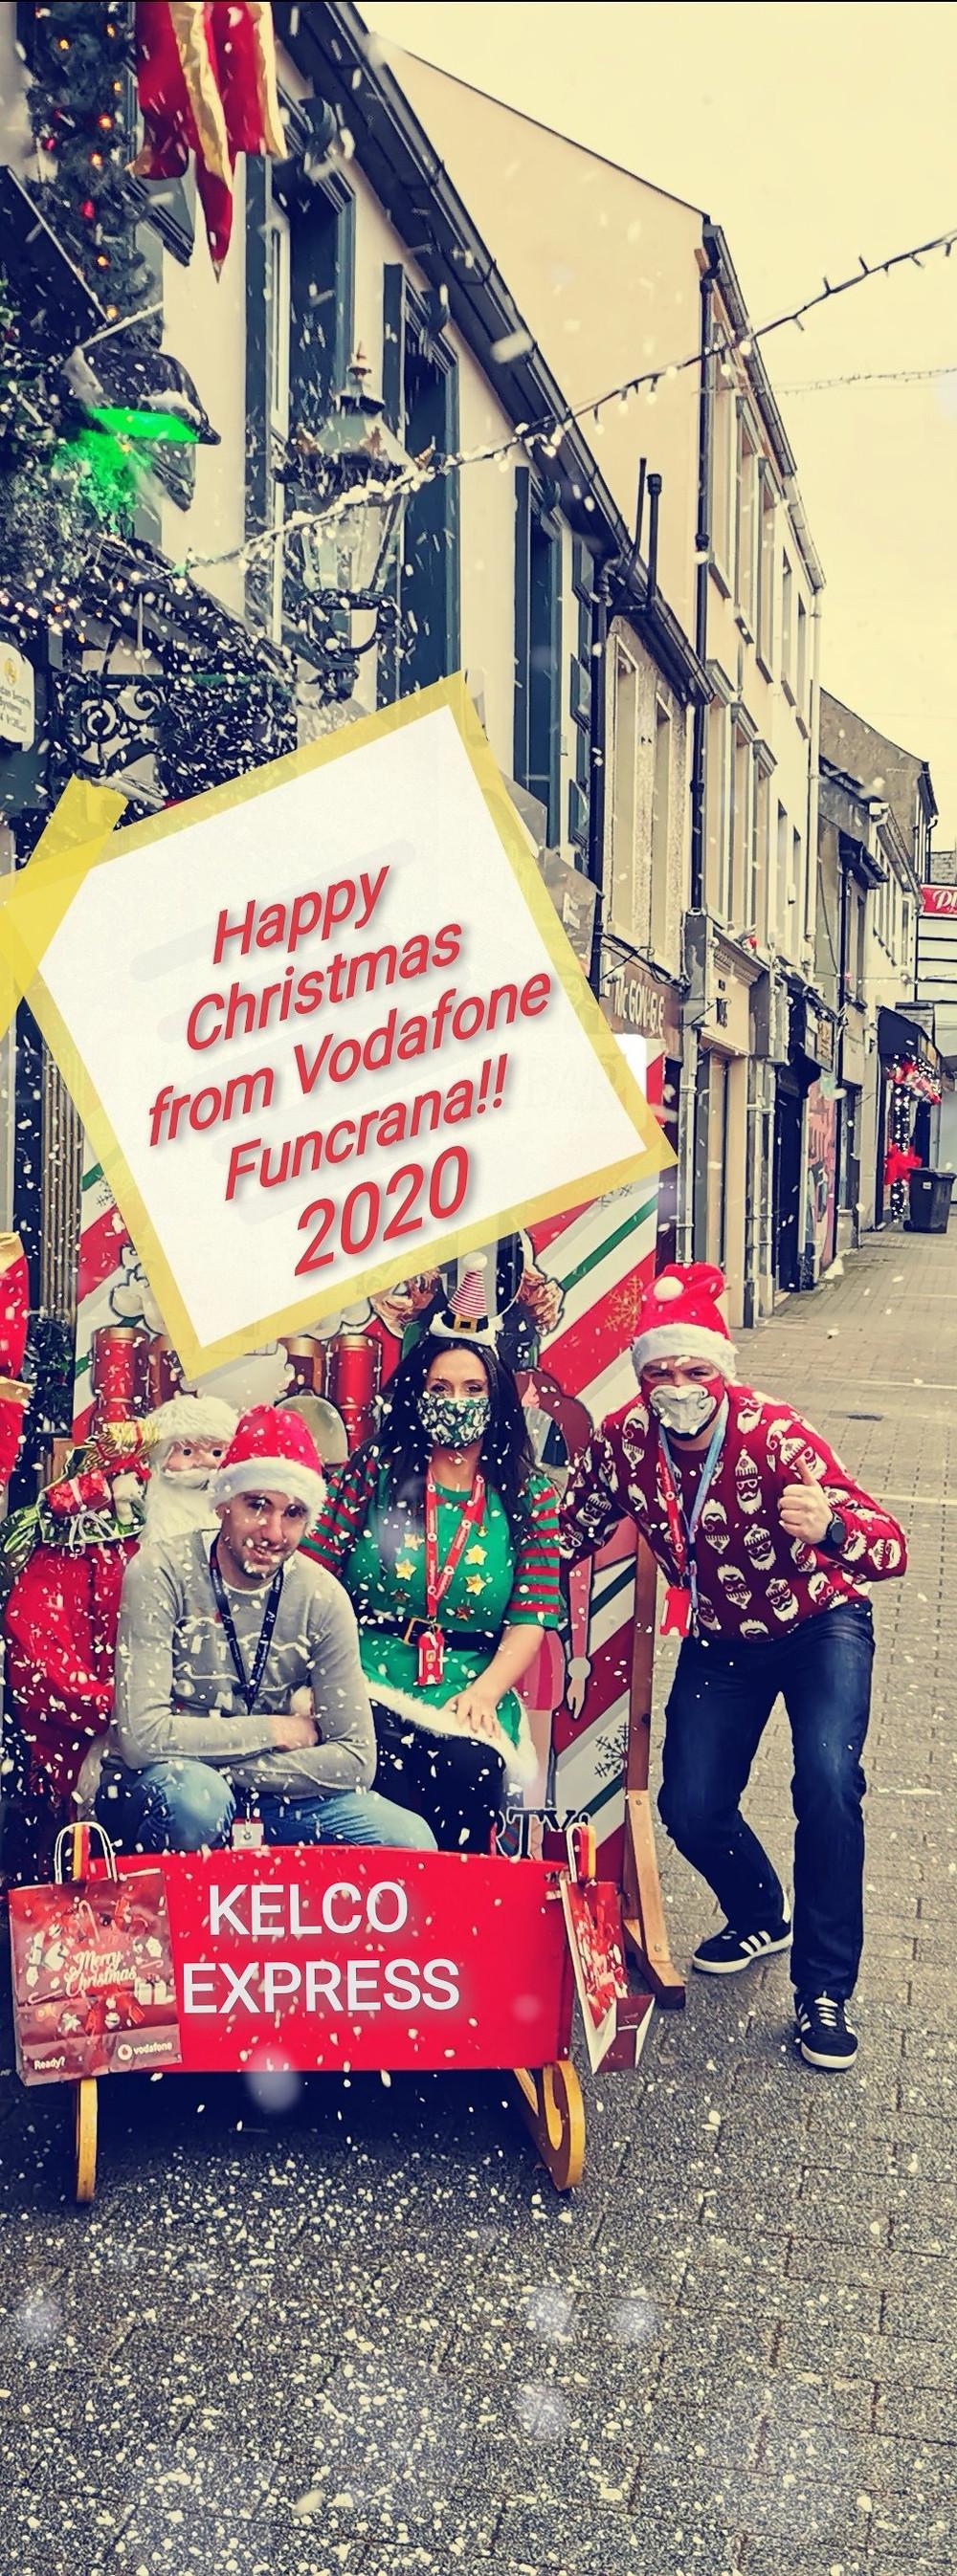 Kelco Buncrana Team on Christmas Jumper Day